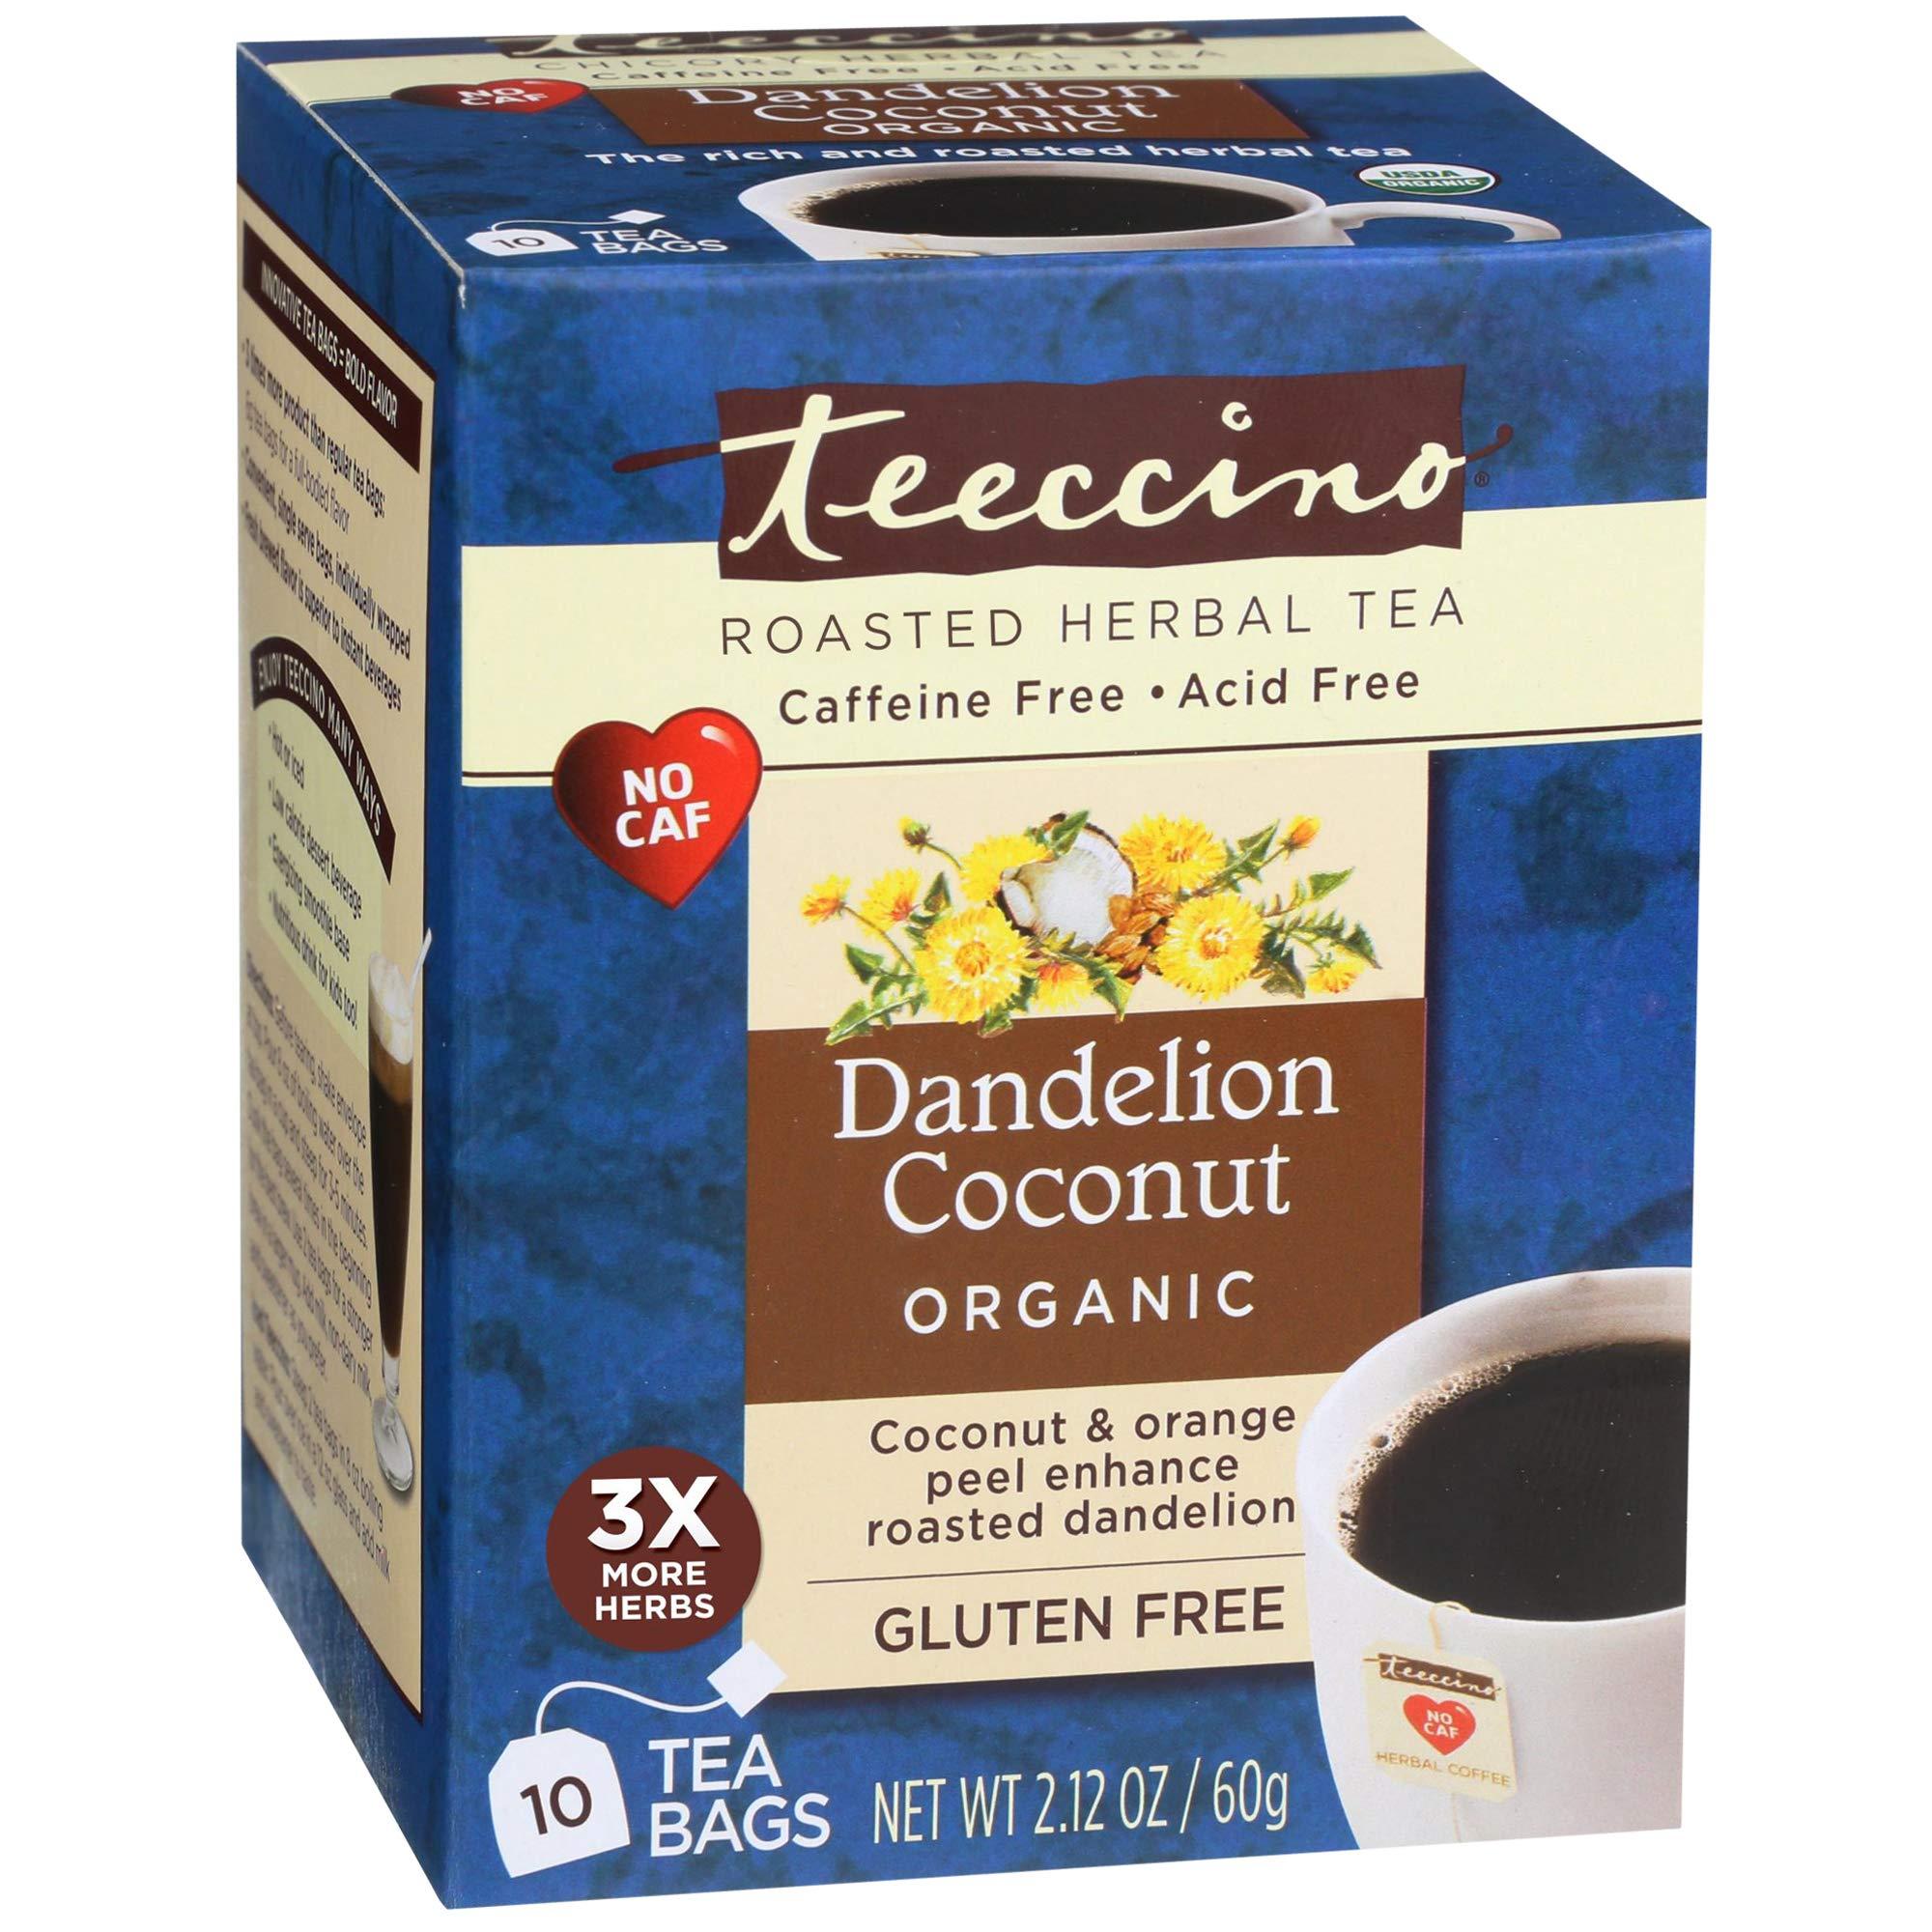 Teeccino Dandelion Tea – Organic Coconut – Roasted Herbal Tea, Organic Dandelion Root, Prebiotic, Caffeine Free, Gluten Free, Acid Free, 10 Tea Bags